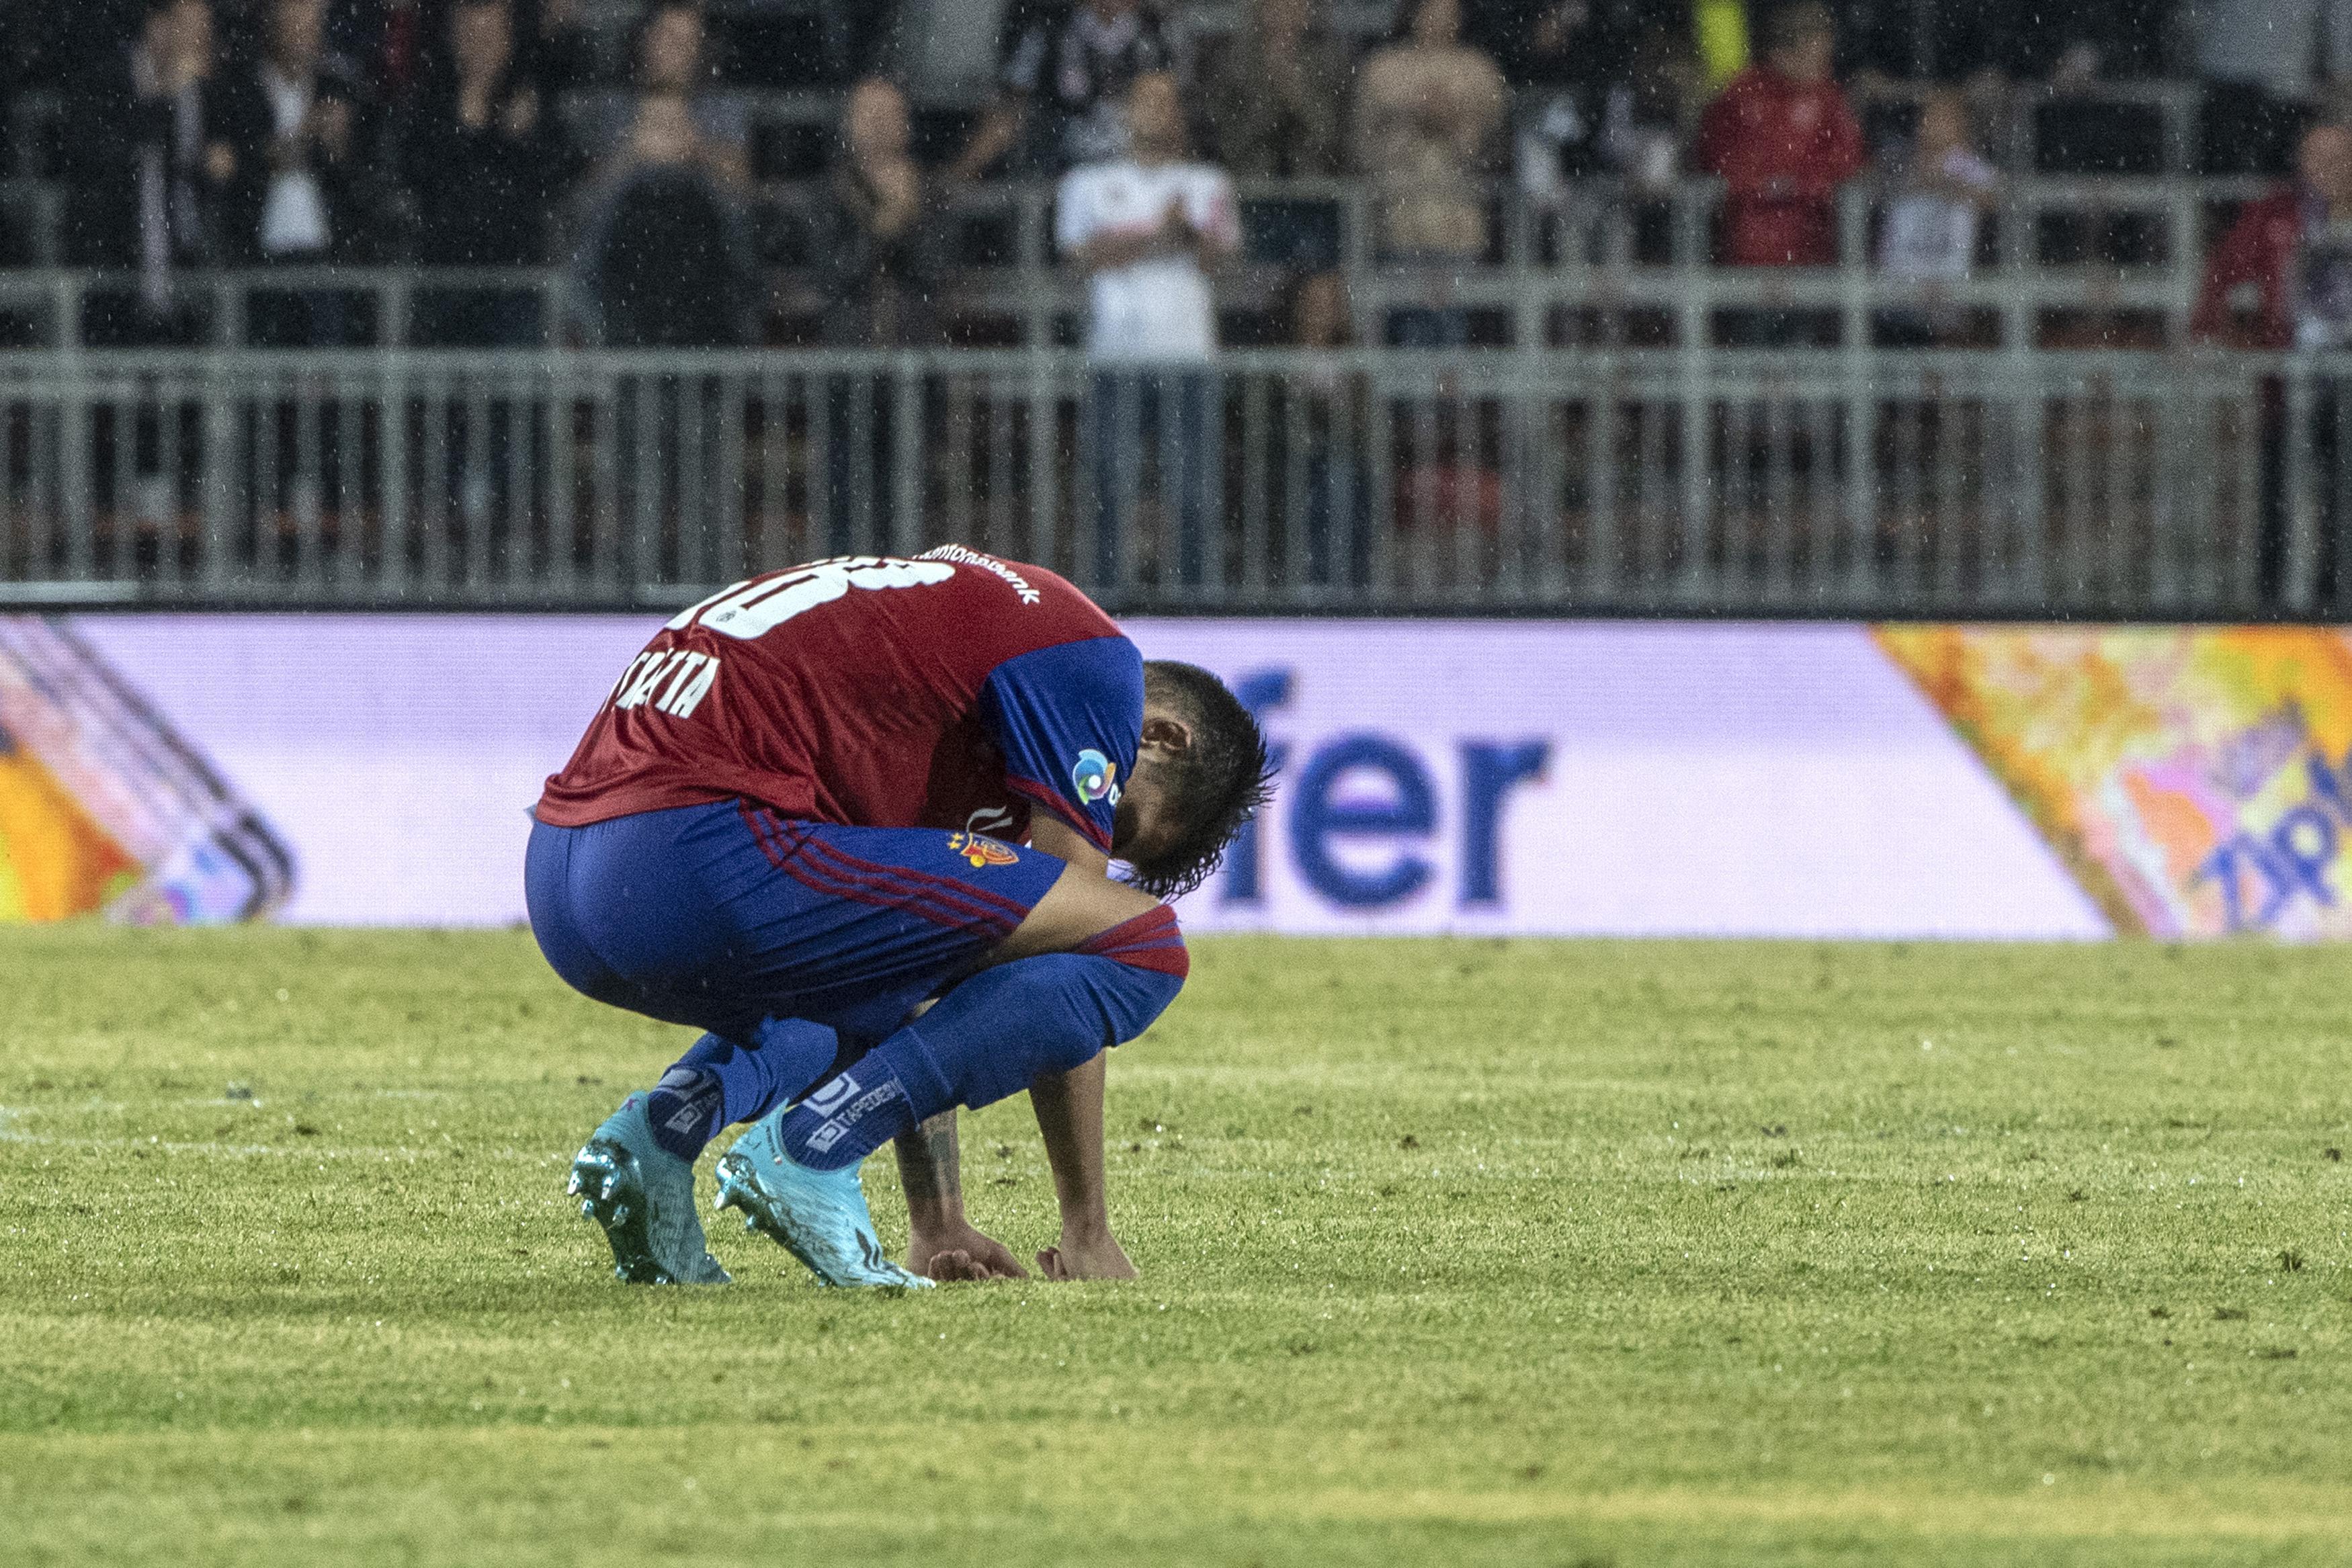 FUSSBALL: UEFA CHAMPIONS LEAGUE / QUALIFIKATION: LASK - FC BASEL